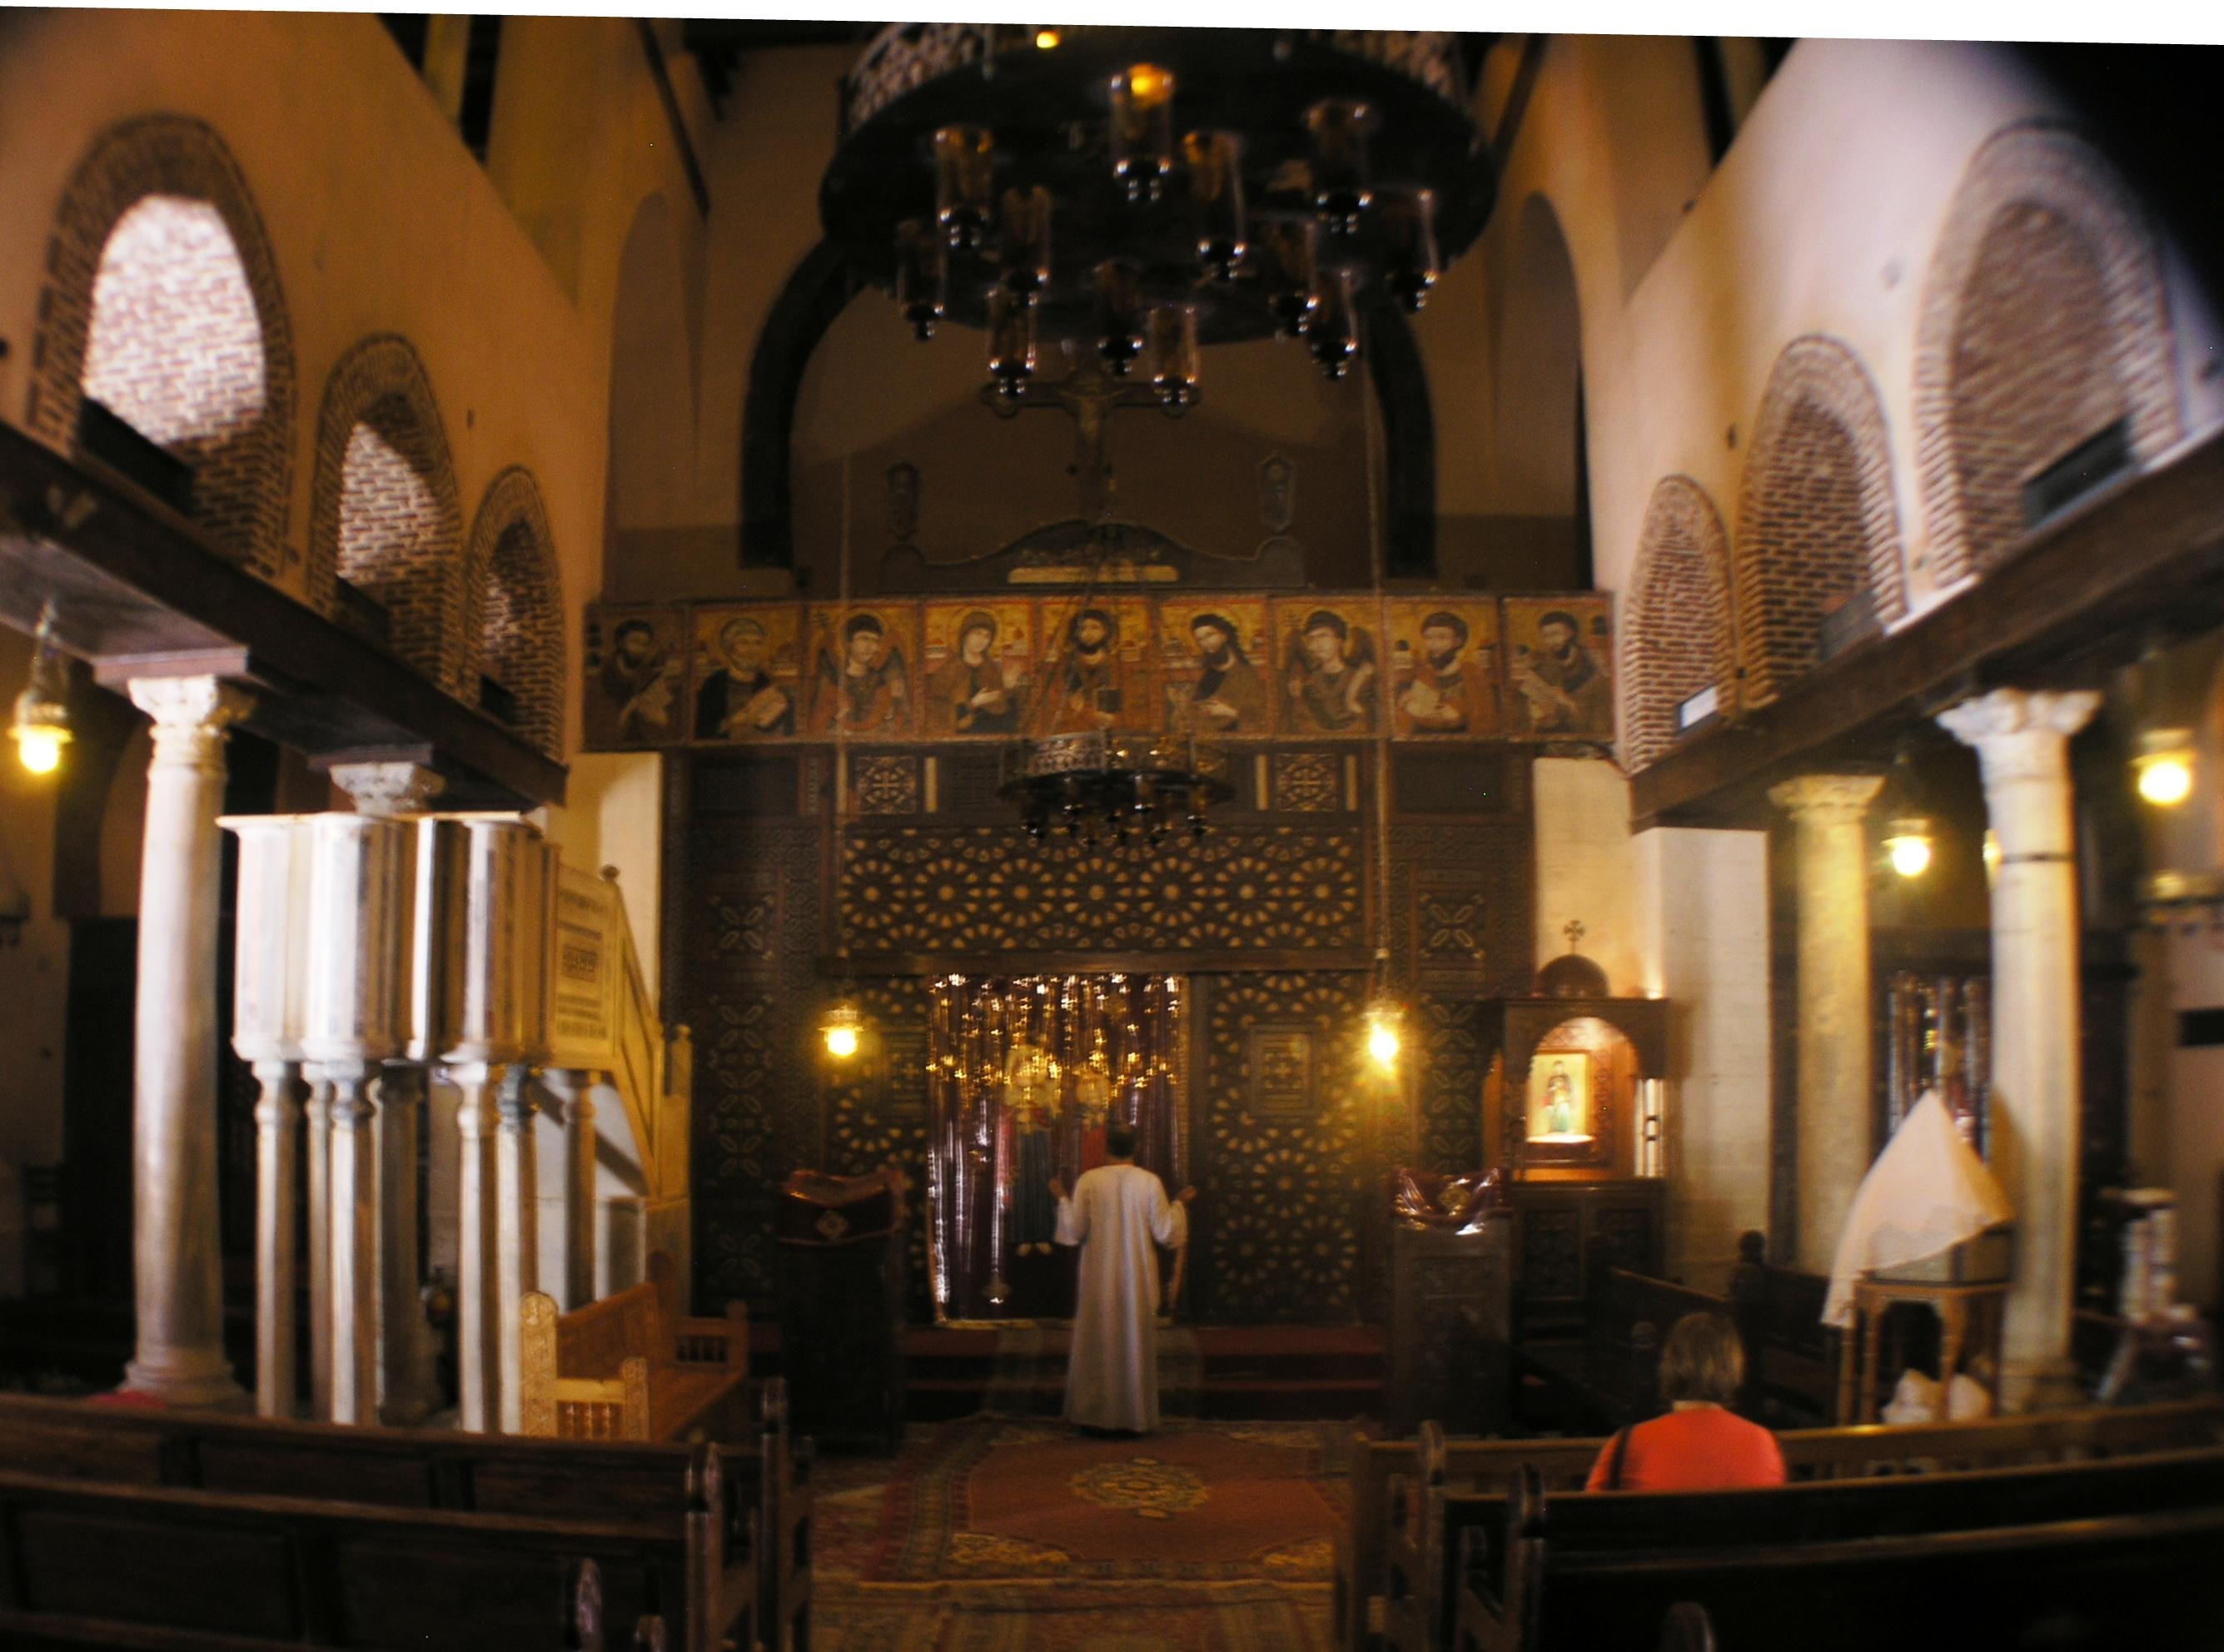 Beautiful Churches In This Area #1: Cairo_-_Coptic_area_-_Church_of_Saint_Barbara_-_inside.JPG